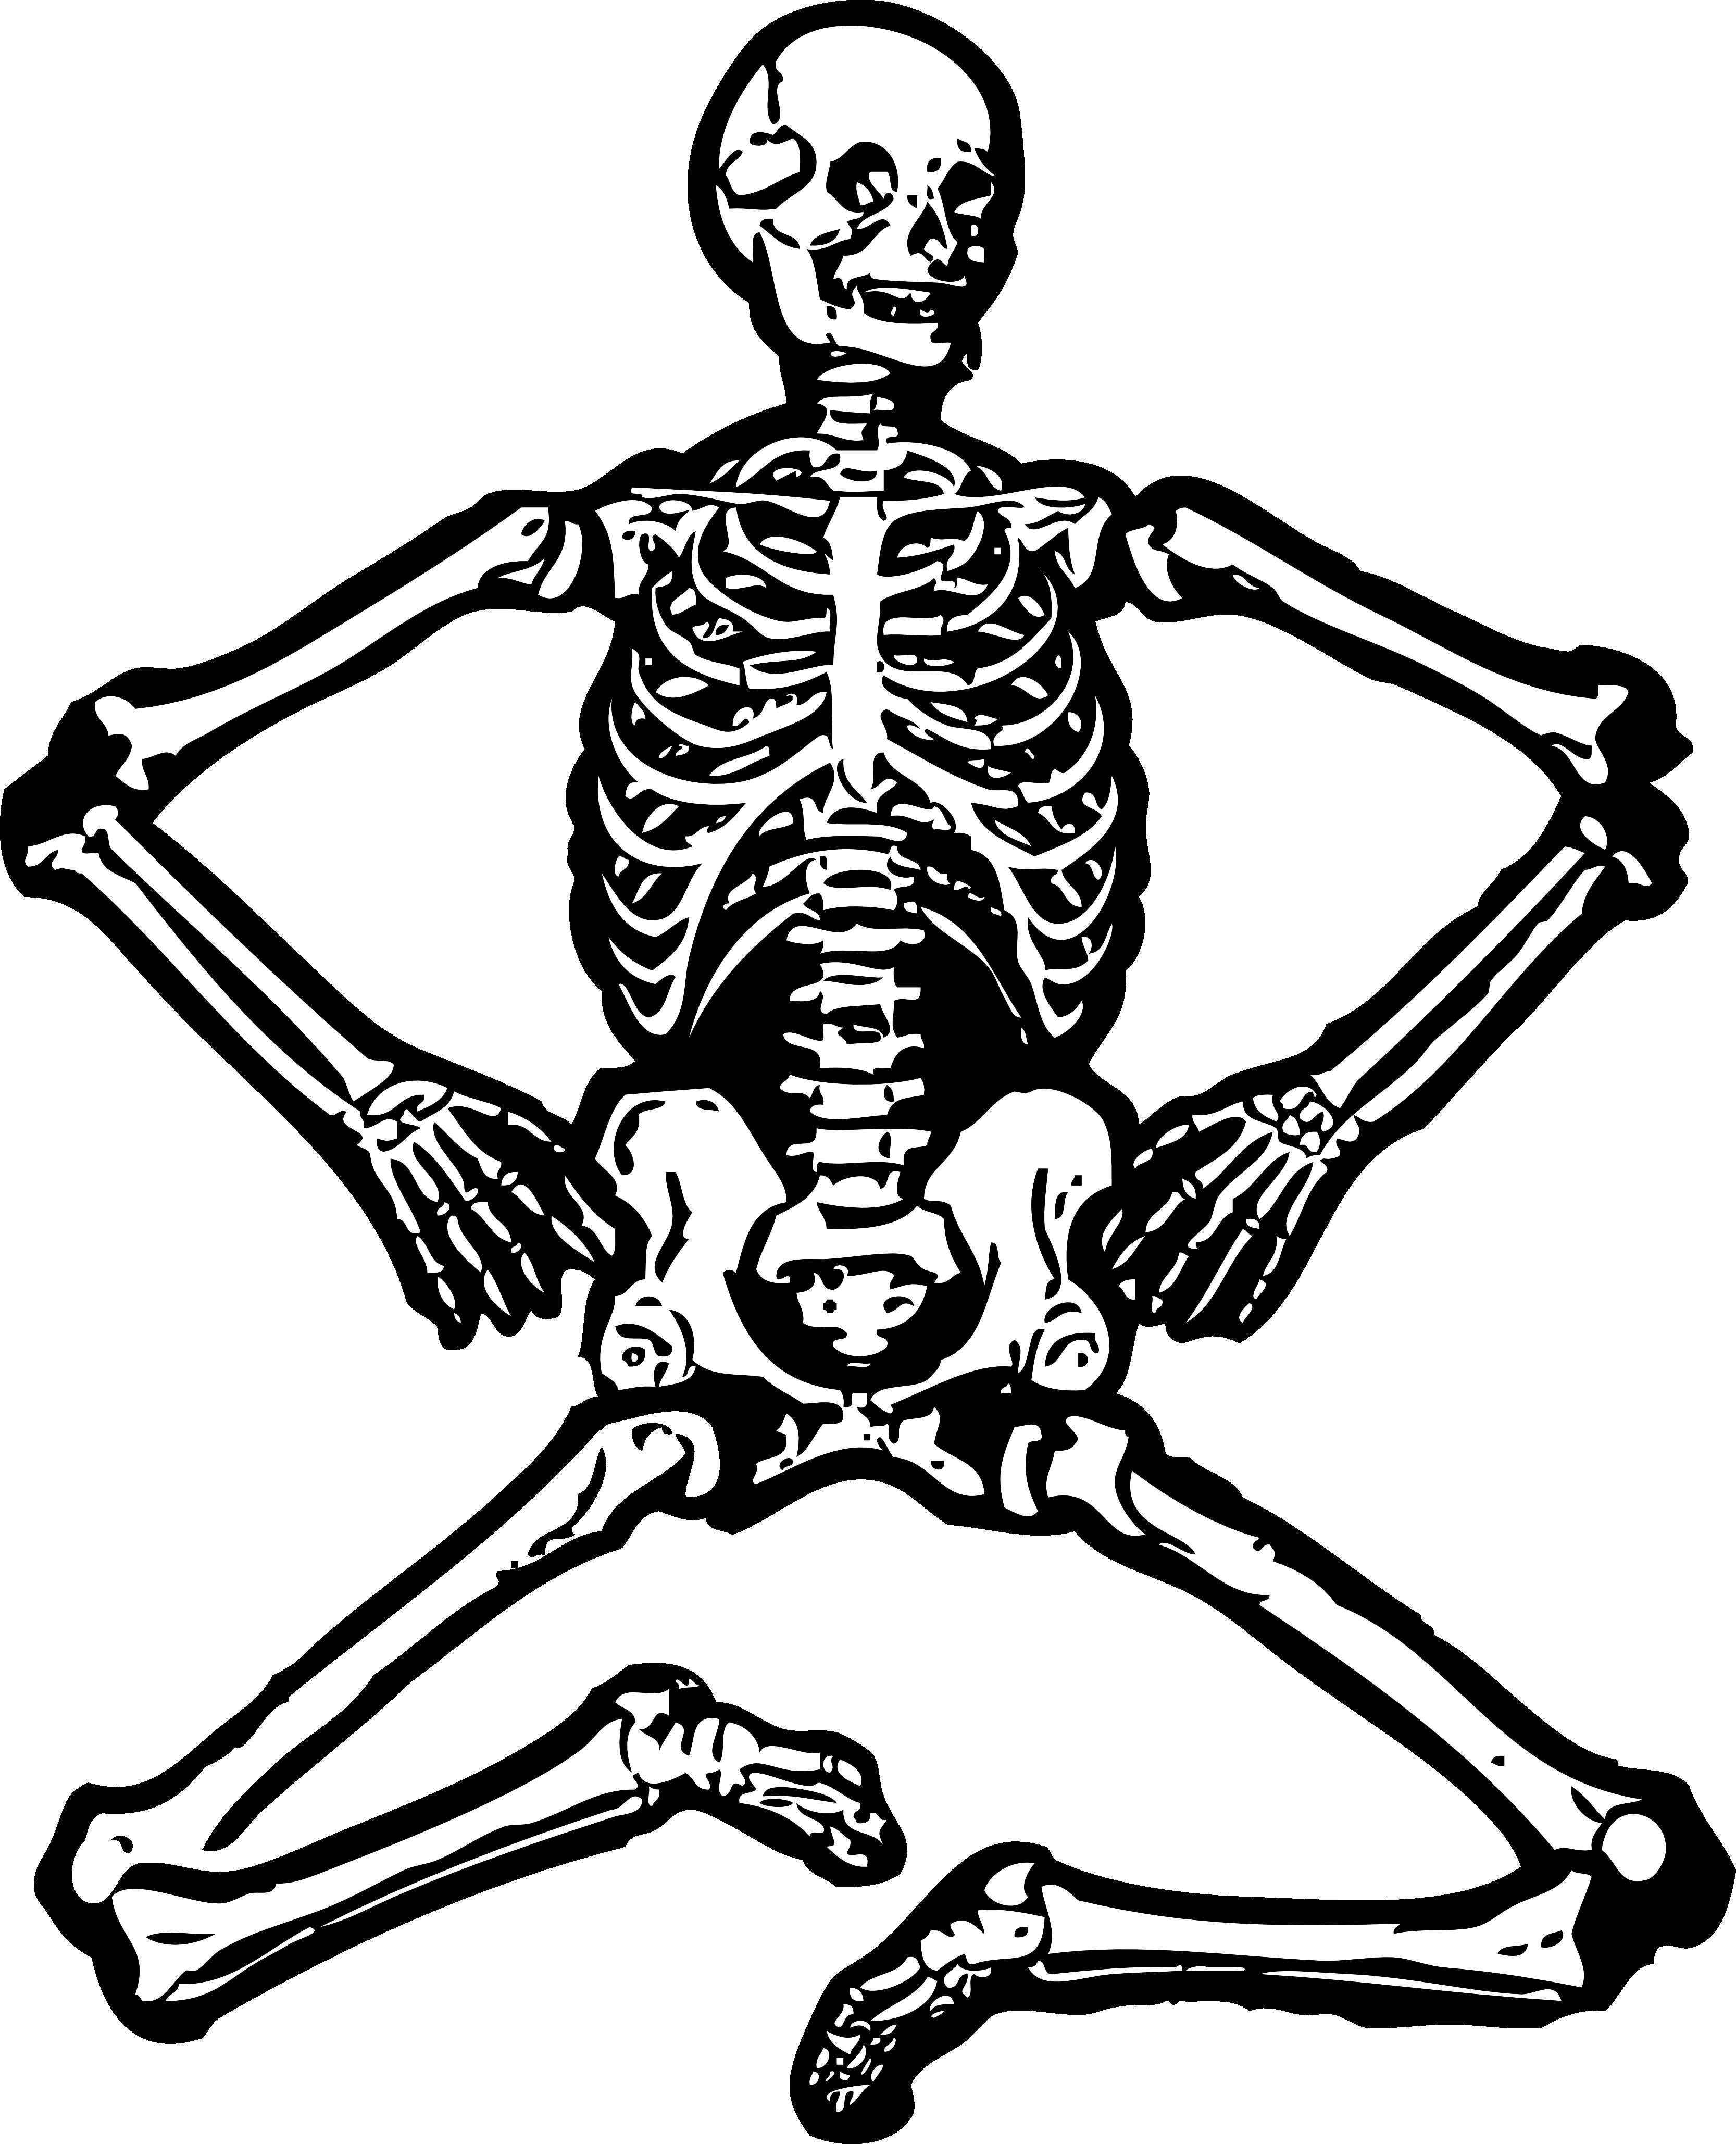 Halloween dancing skeleton clipart picture freeuse download Sleleton Clipart Skeleton Body Free collection | Download and share ... picture freeuse download